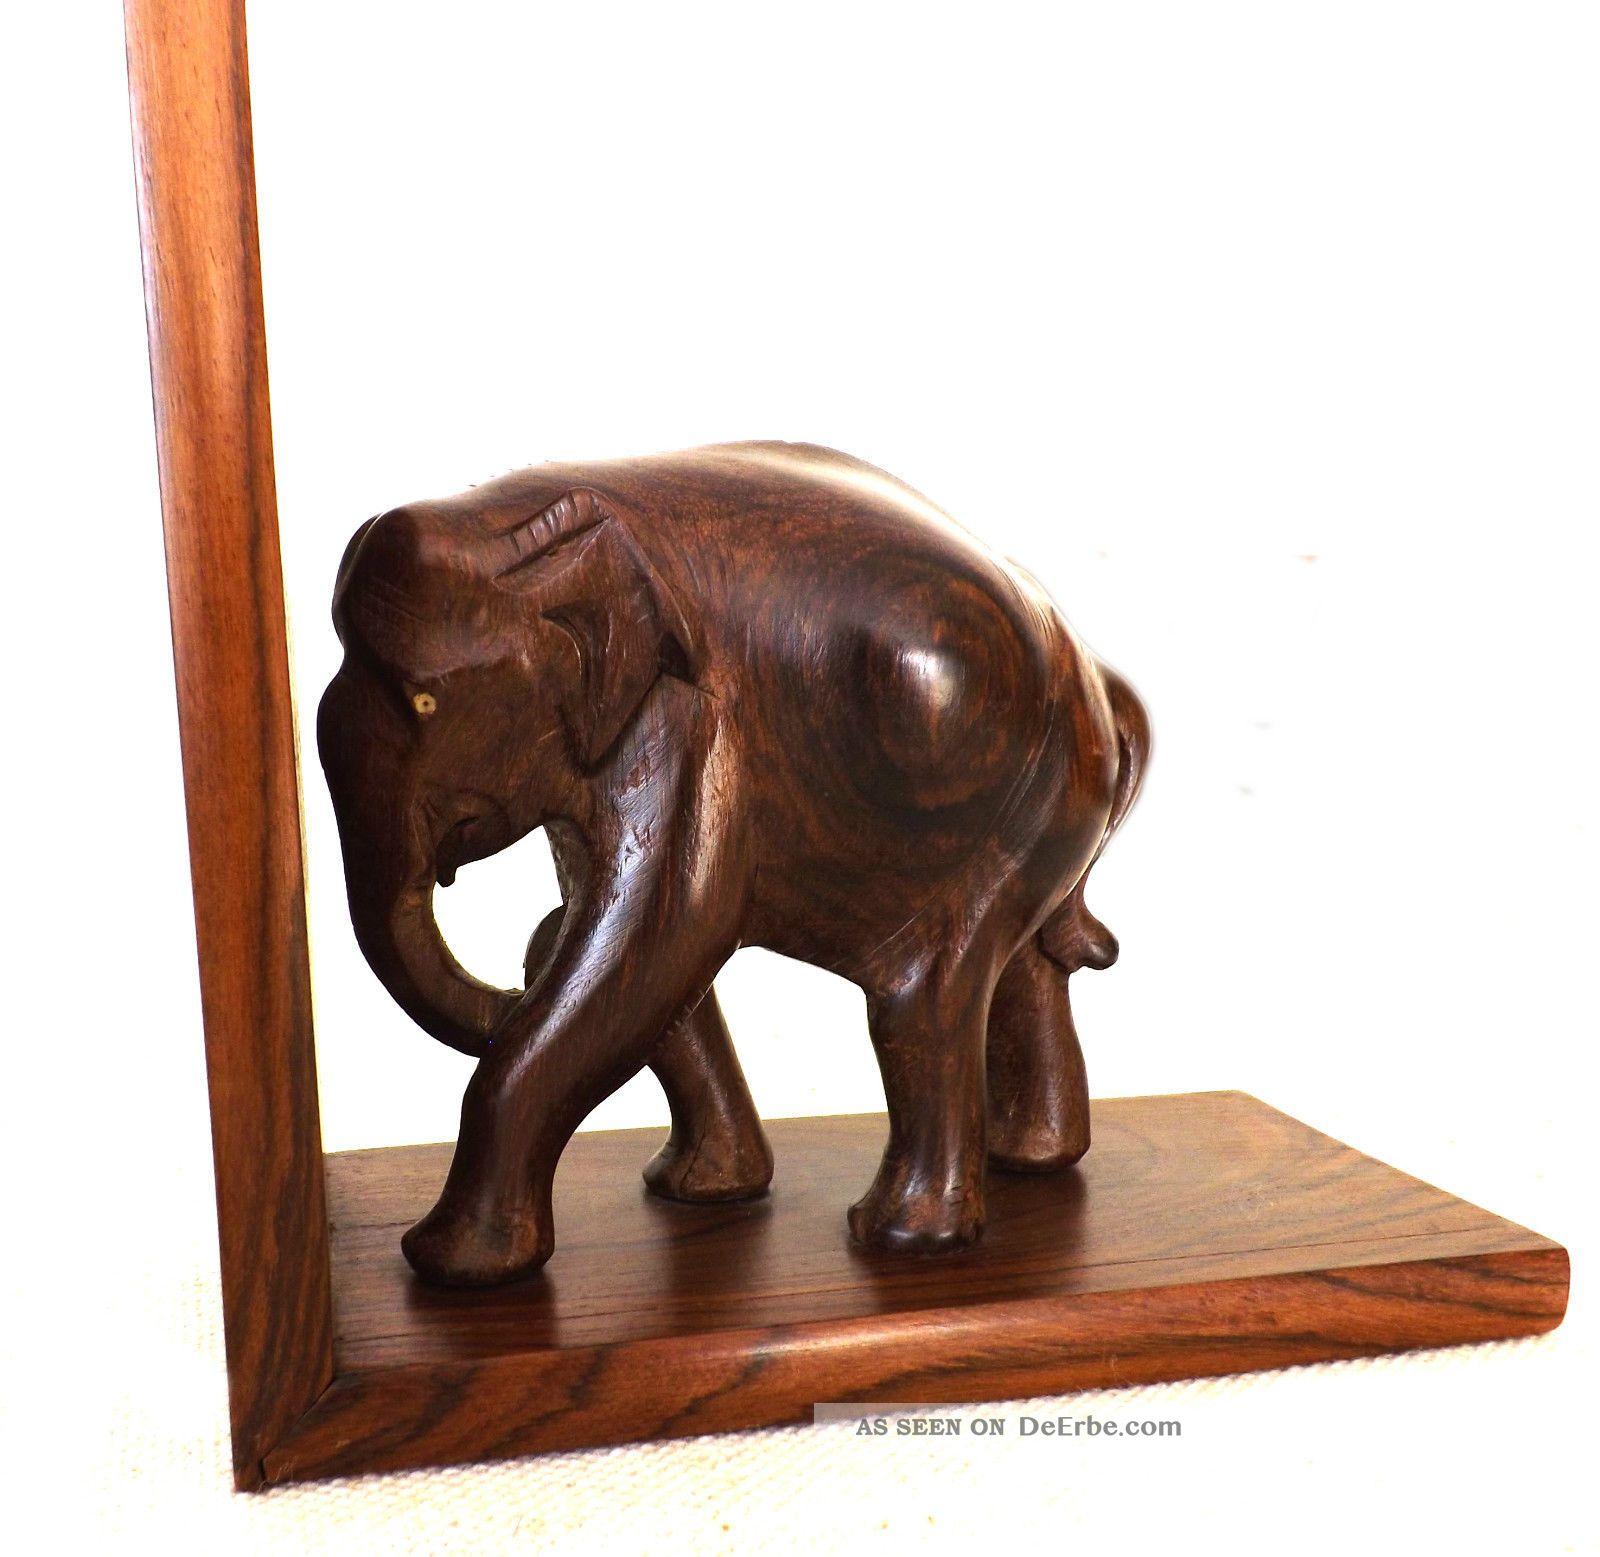 buchst tzen elefanten holz b cher. Black Bedroom Furniture Sets. Home Design Ideas